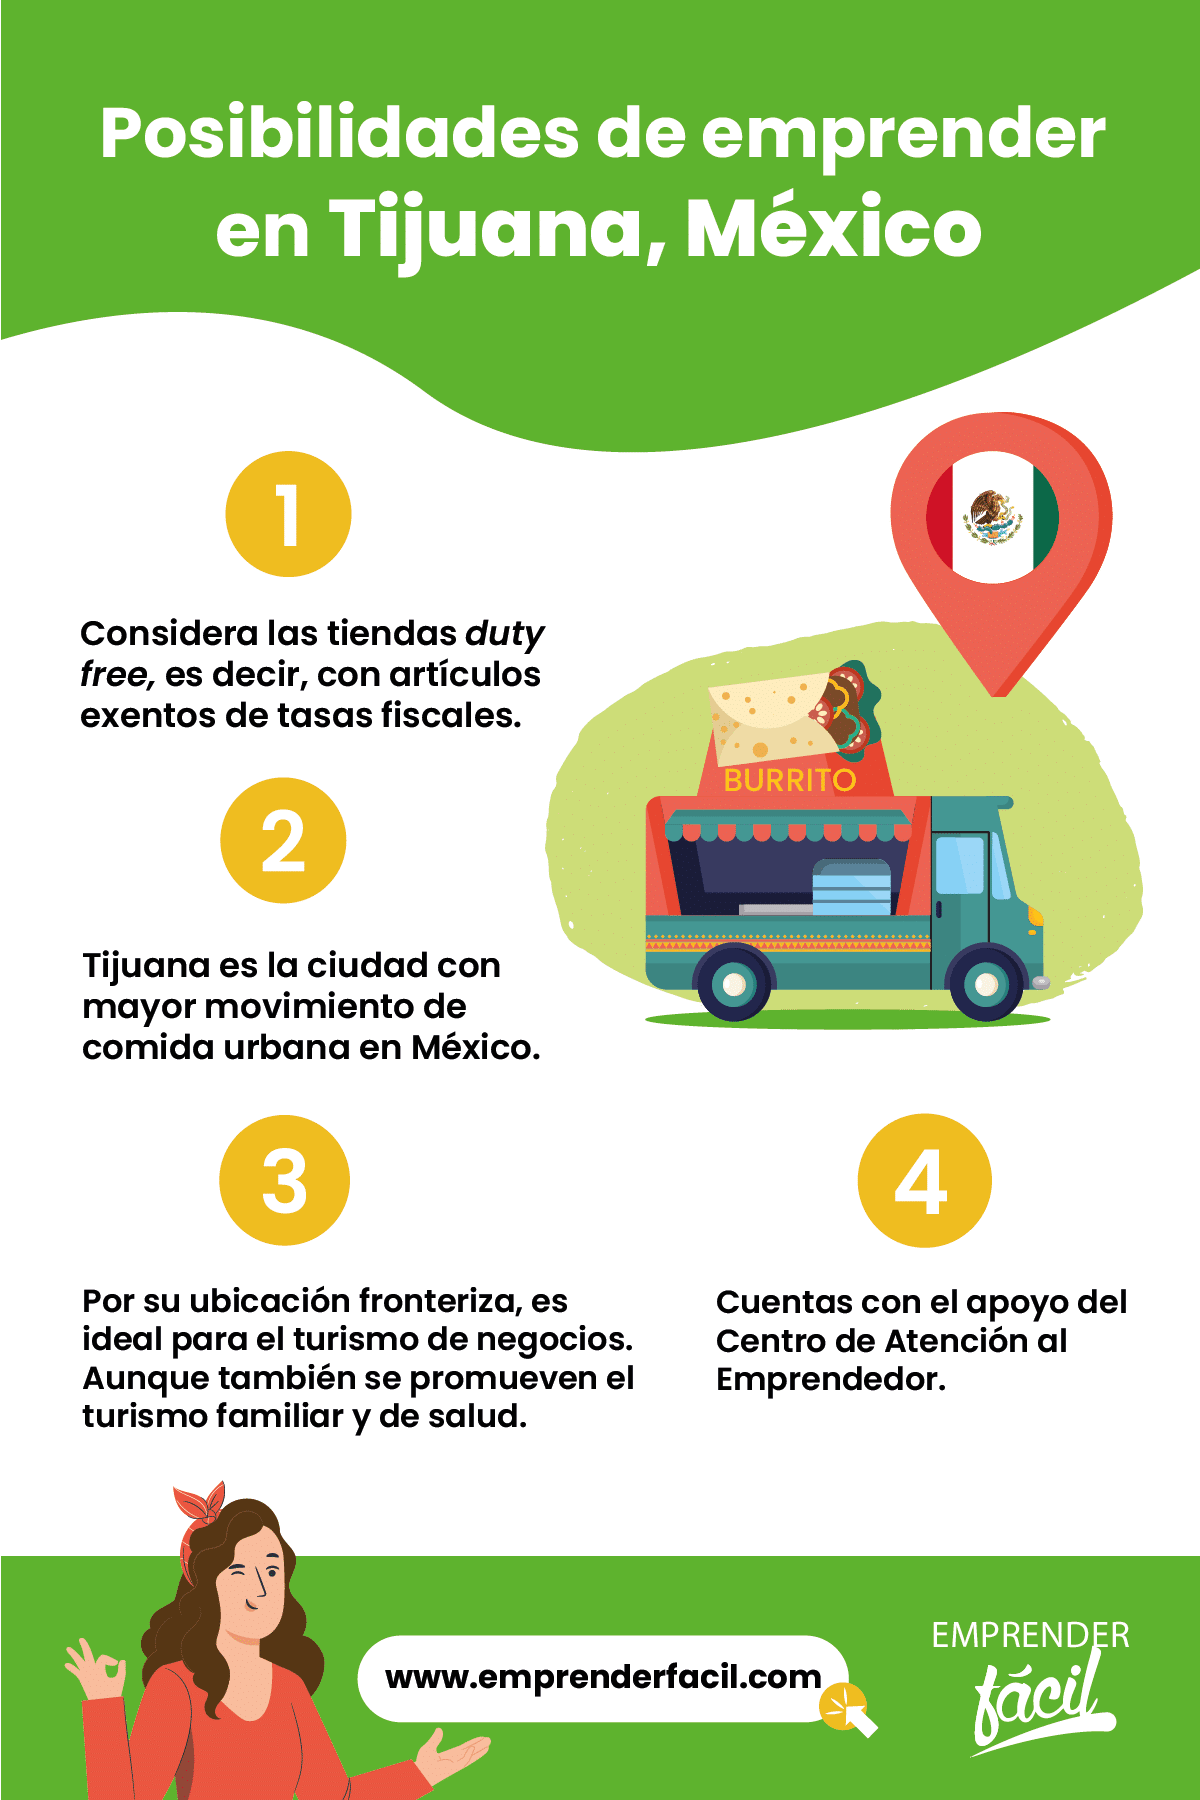 Negocios rentables en Tijuana, México.